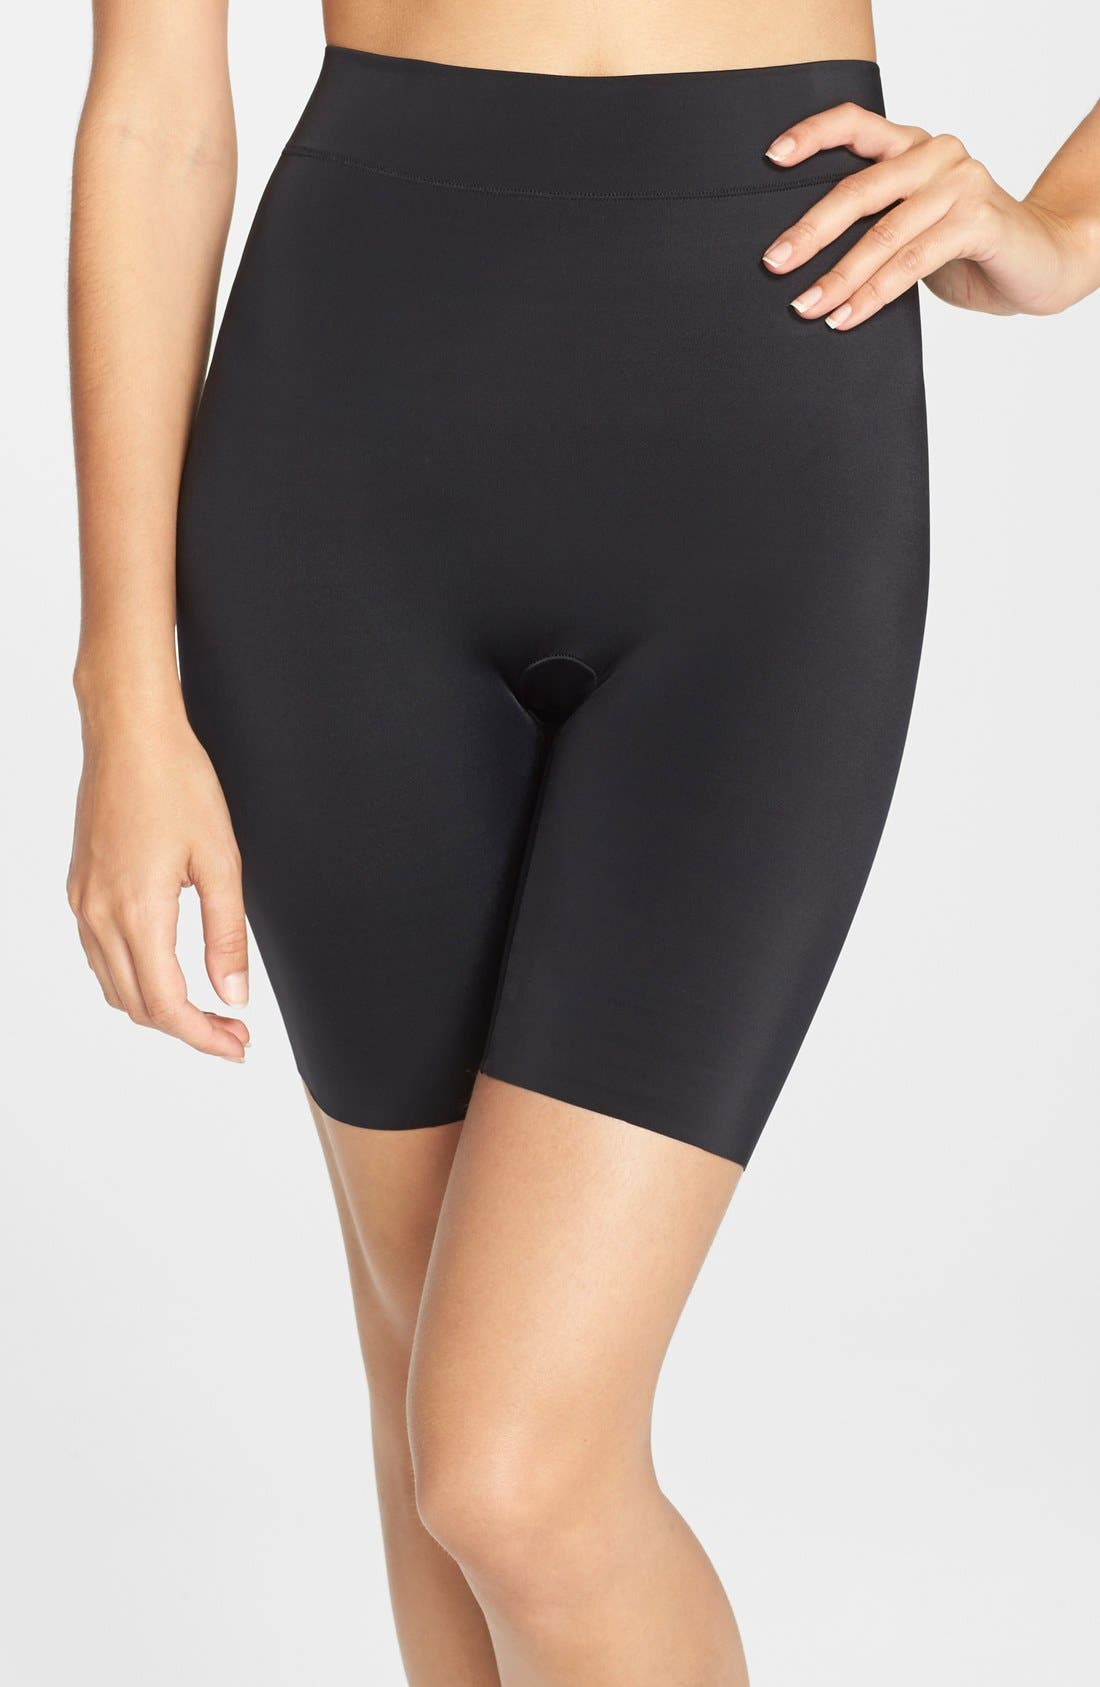 Belly Bandit® 'Mother Tucker - Shortie' High Waist Compression Shorts